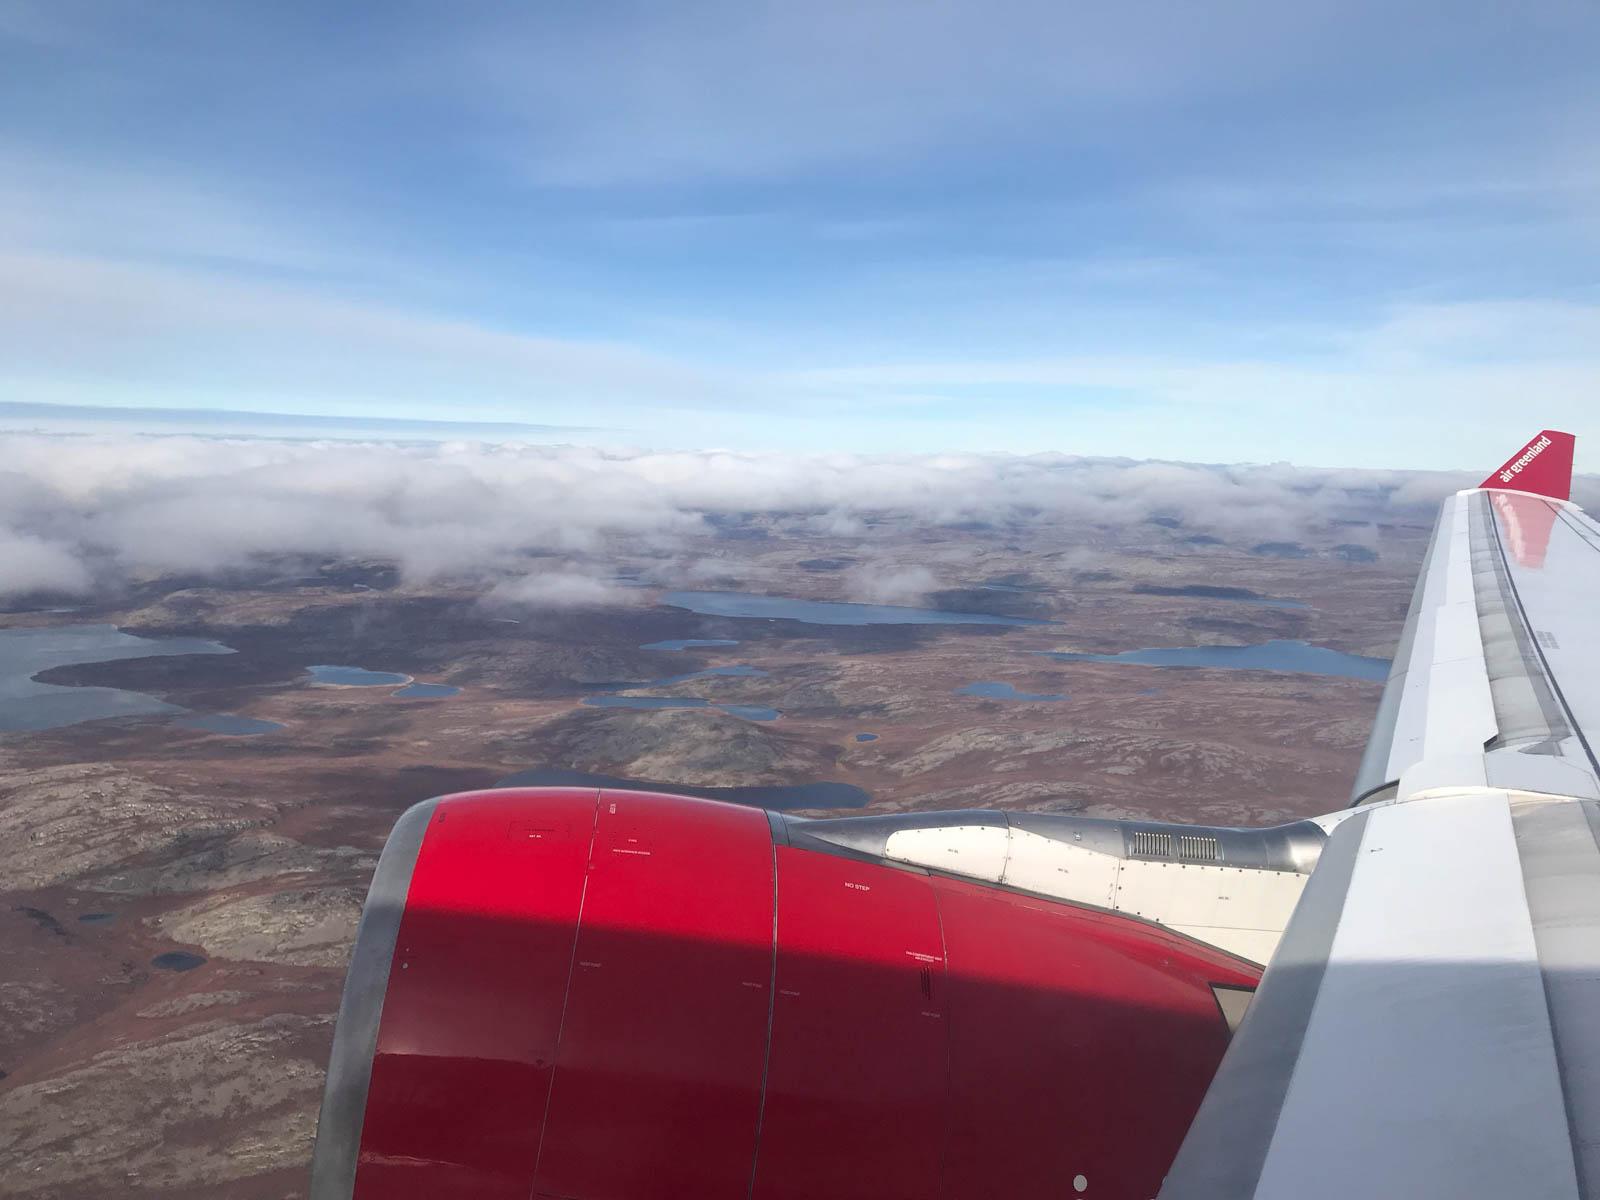 Rückflug von Kangerlussuaq, Grönland